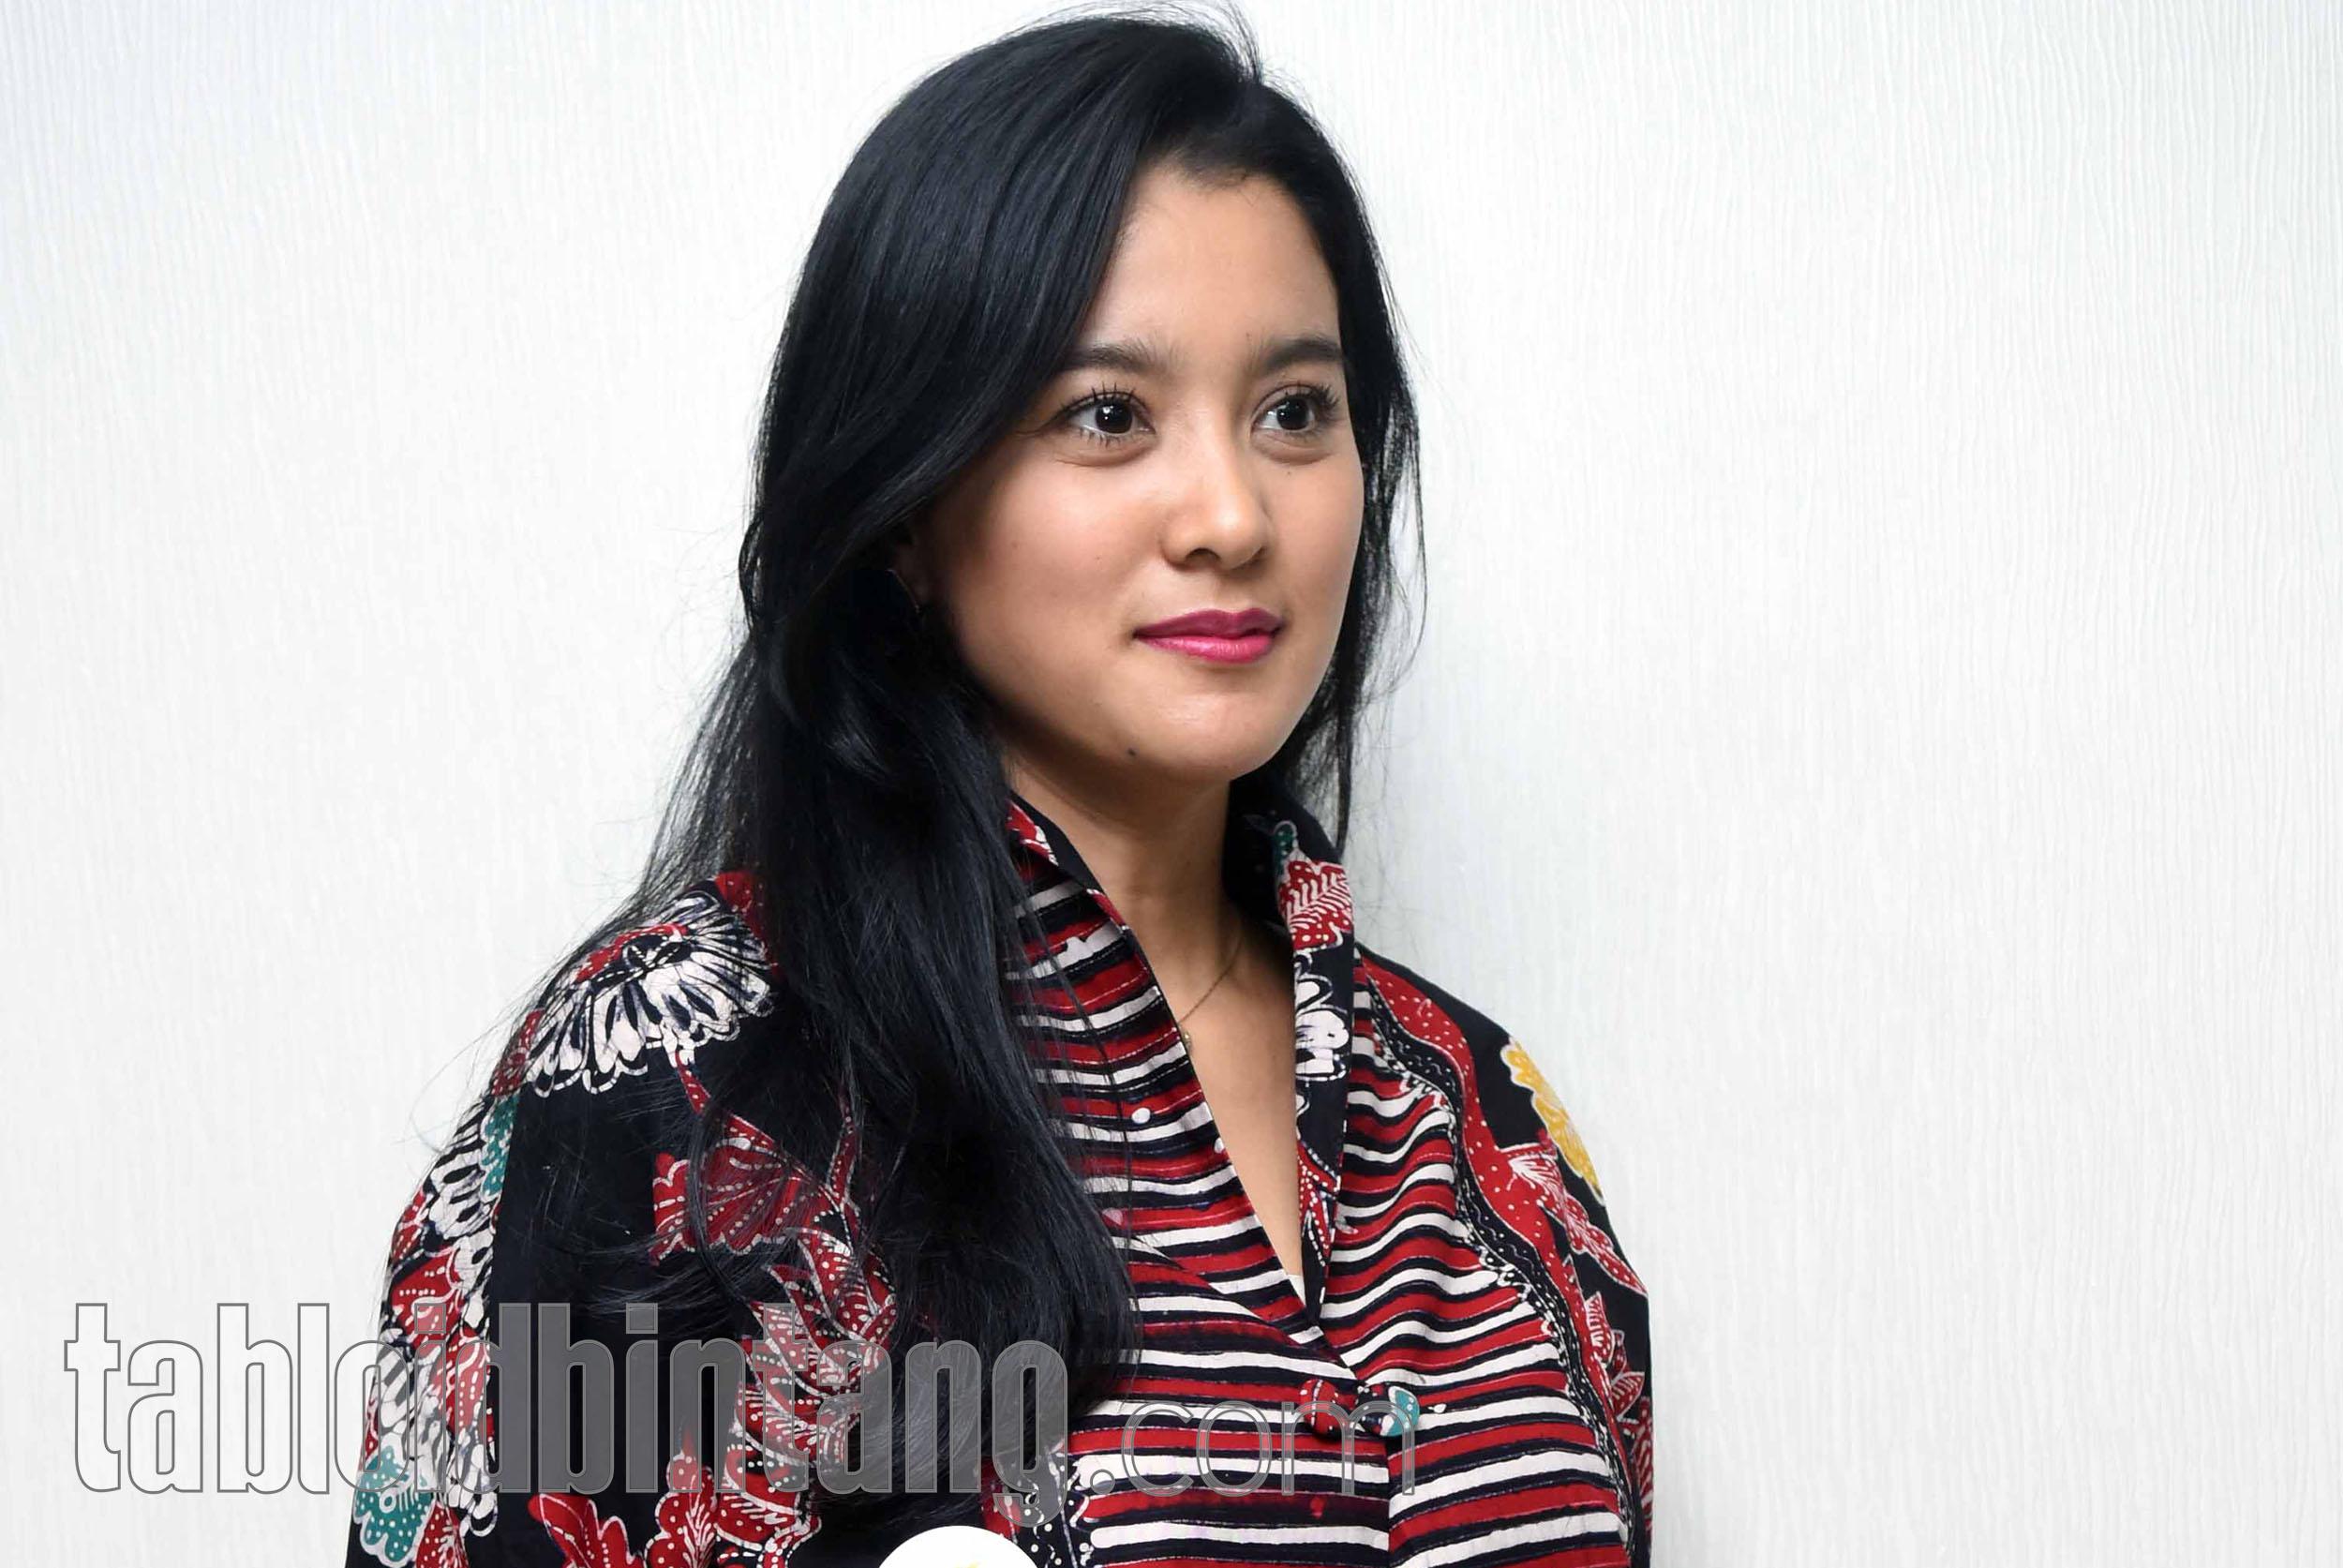 Marcella Zalianty Jenguk Pretty Asmara di Tahanan